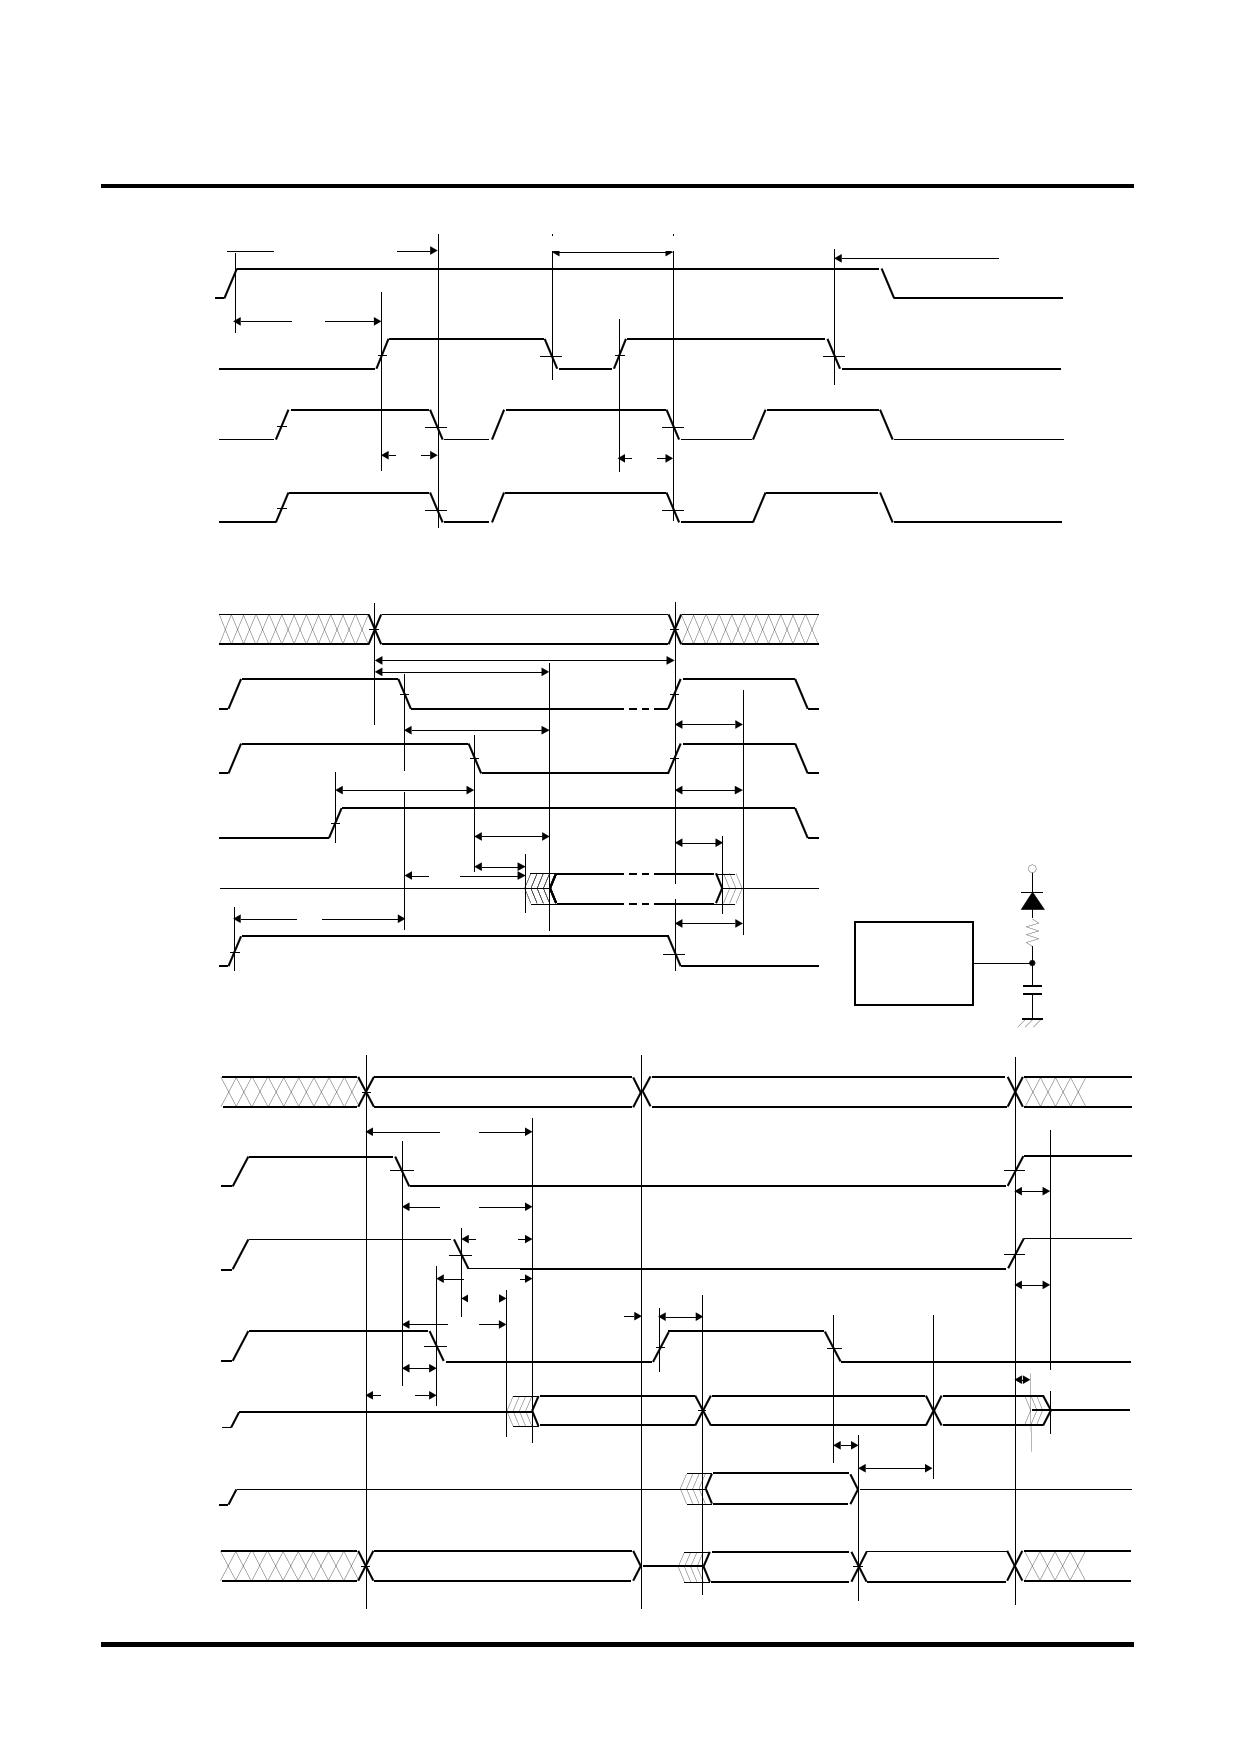 M5M29FB800RV-10 transistor, diode fet, igbt, scr